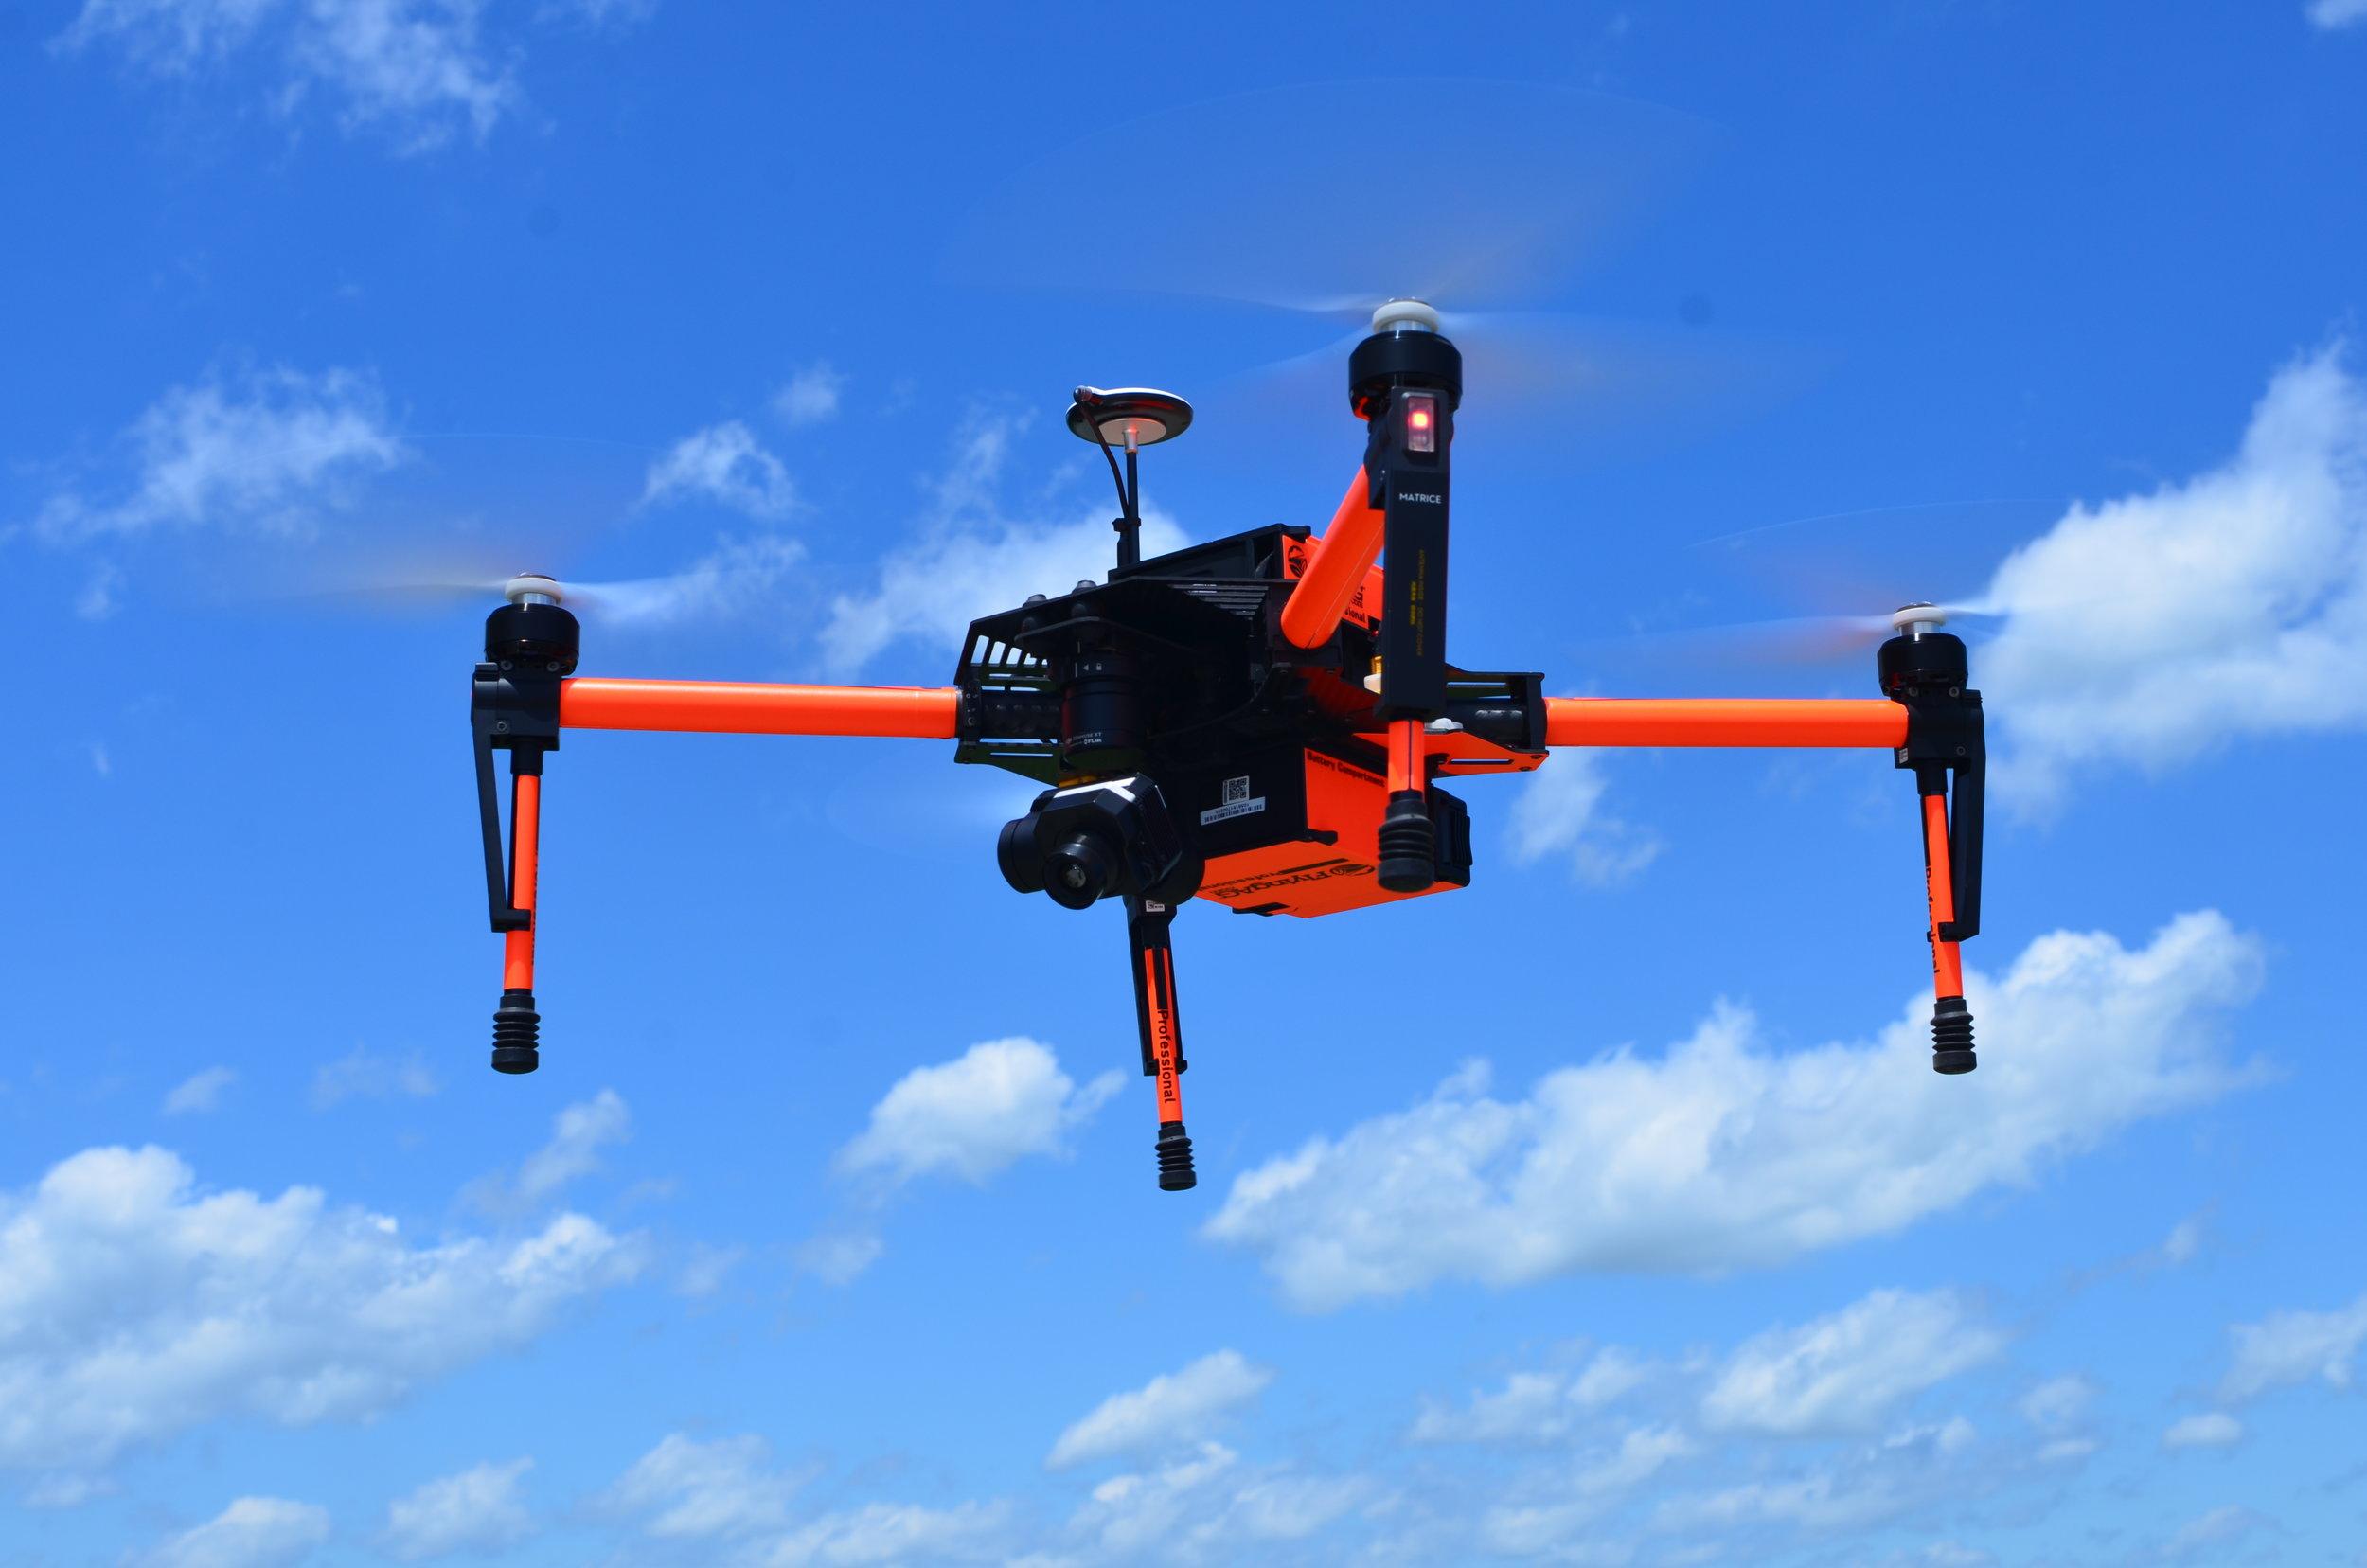 FlyingAg's Matrice w/  NEW FLIR Thermal camera .